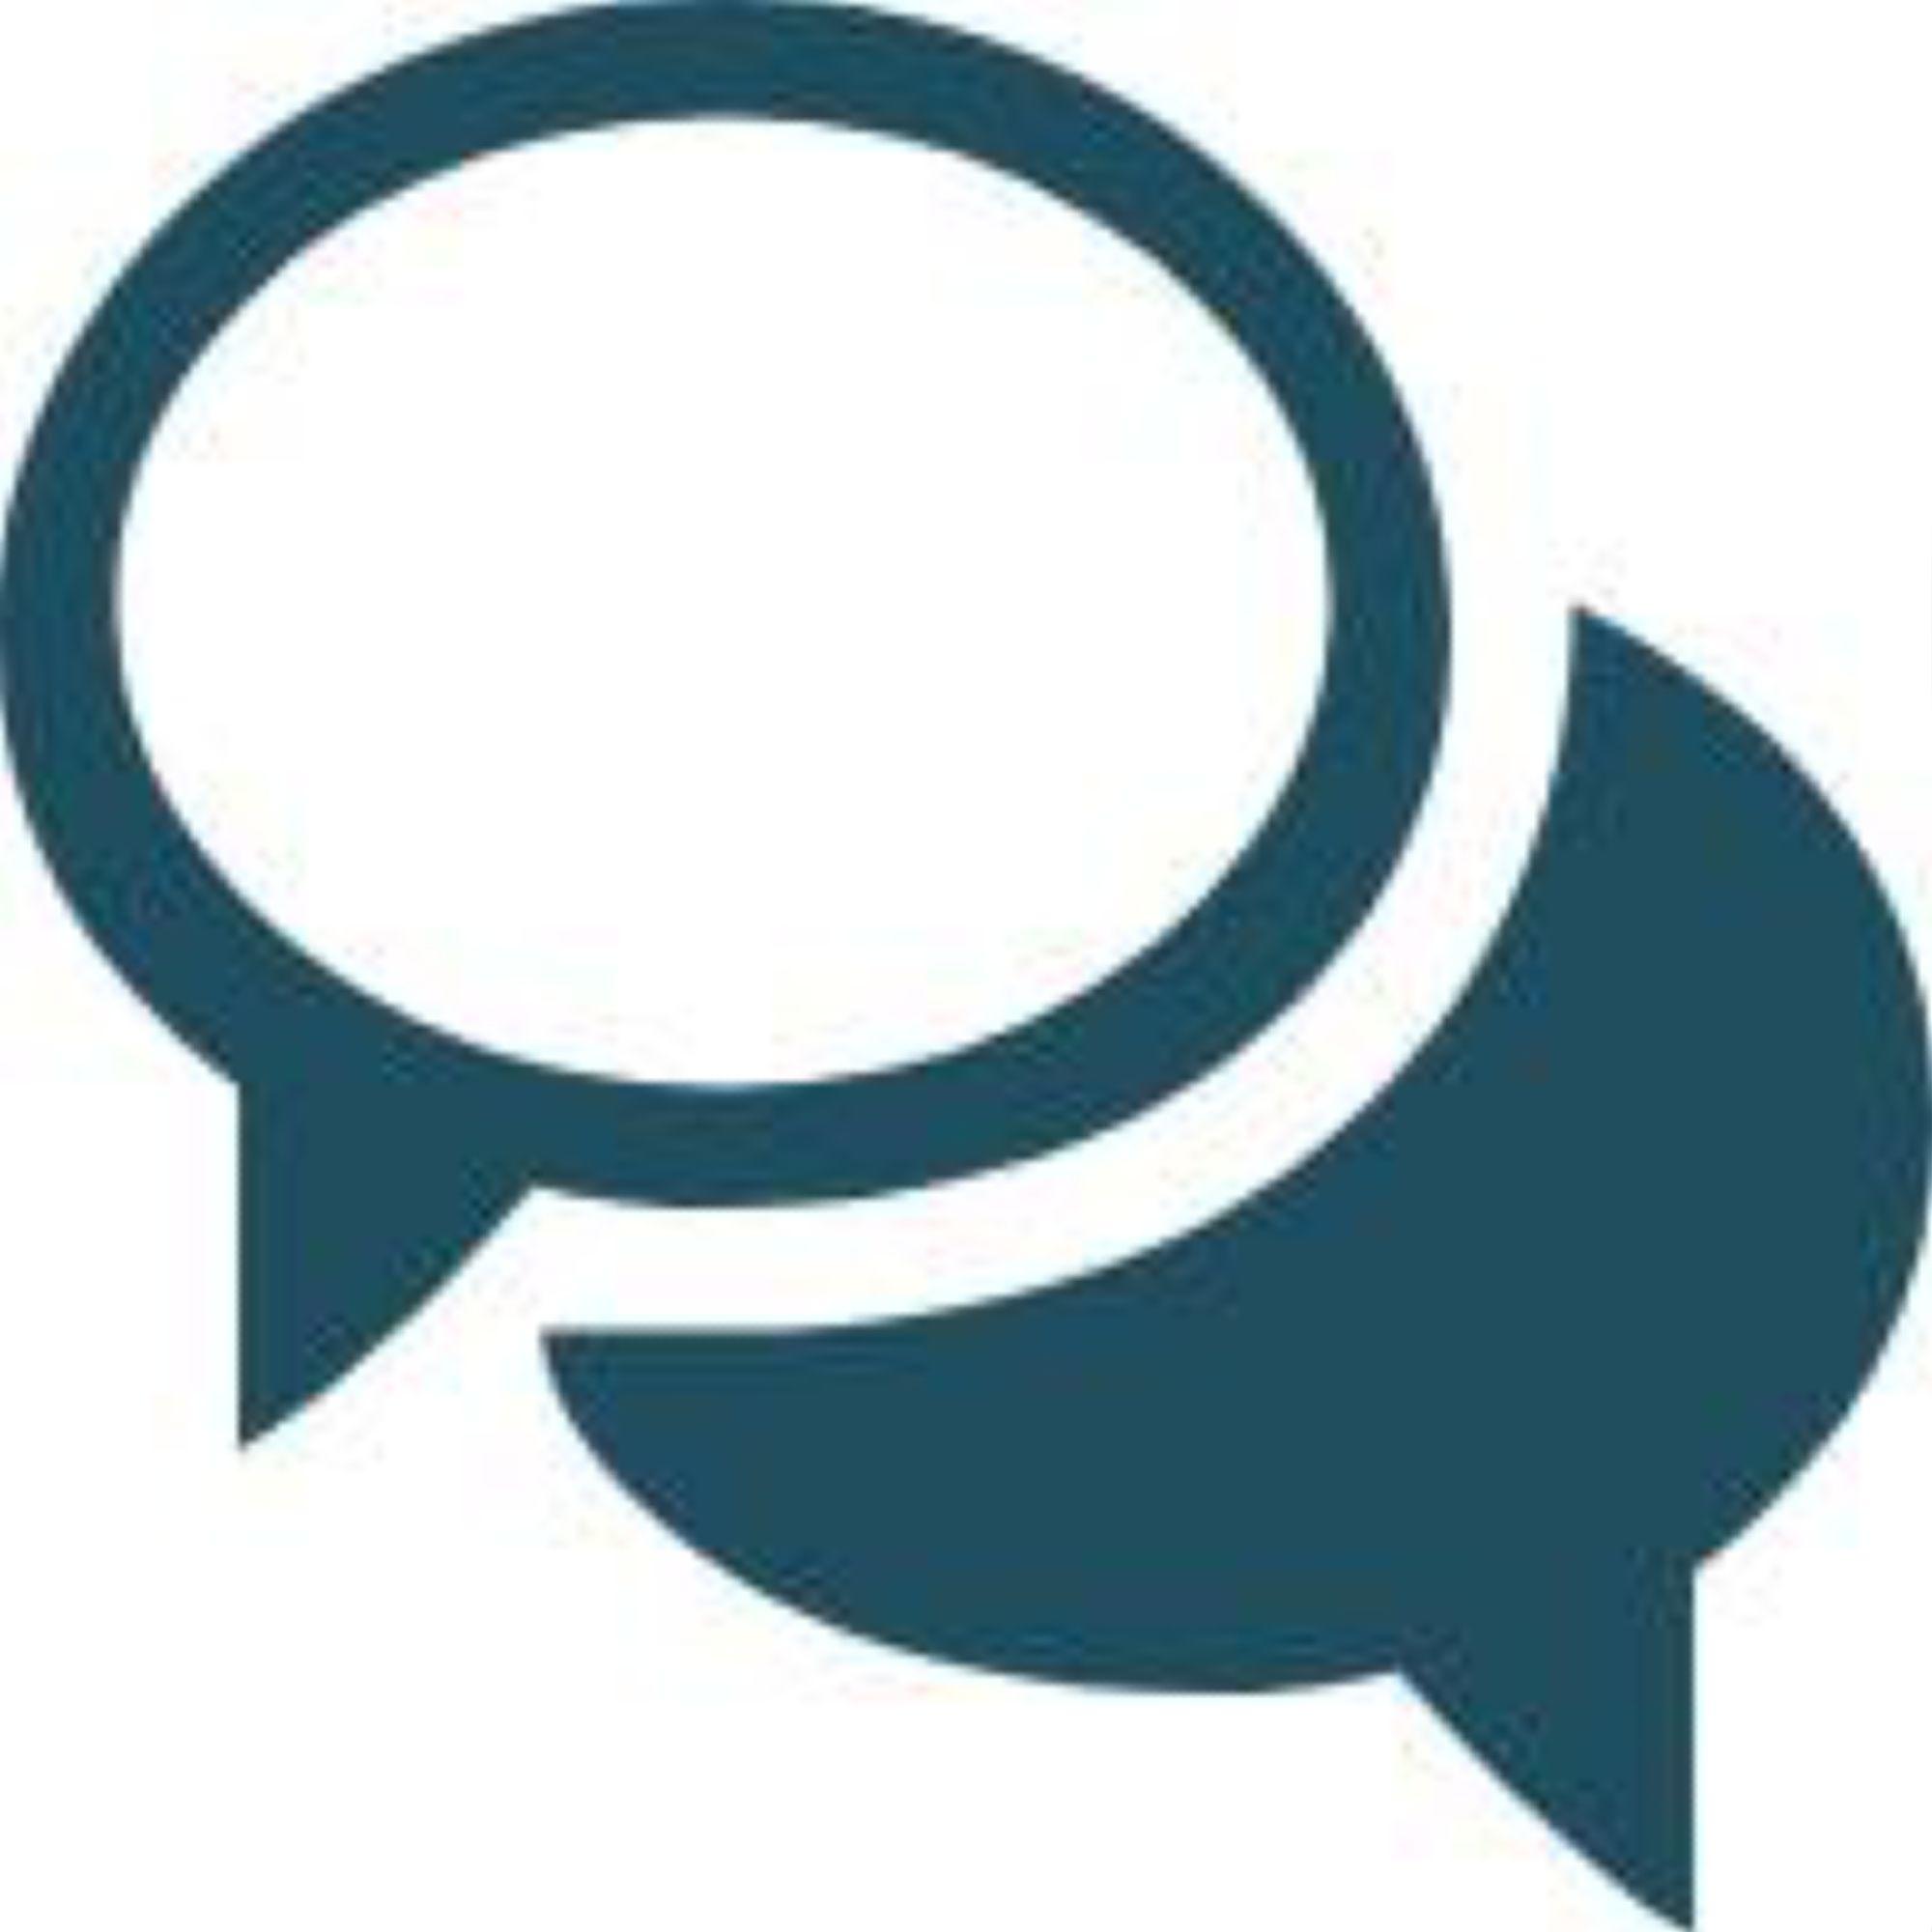 icon_chat_symbol_sprechblase_illustration.jpg